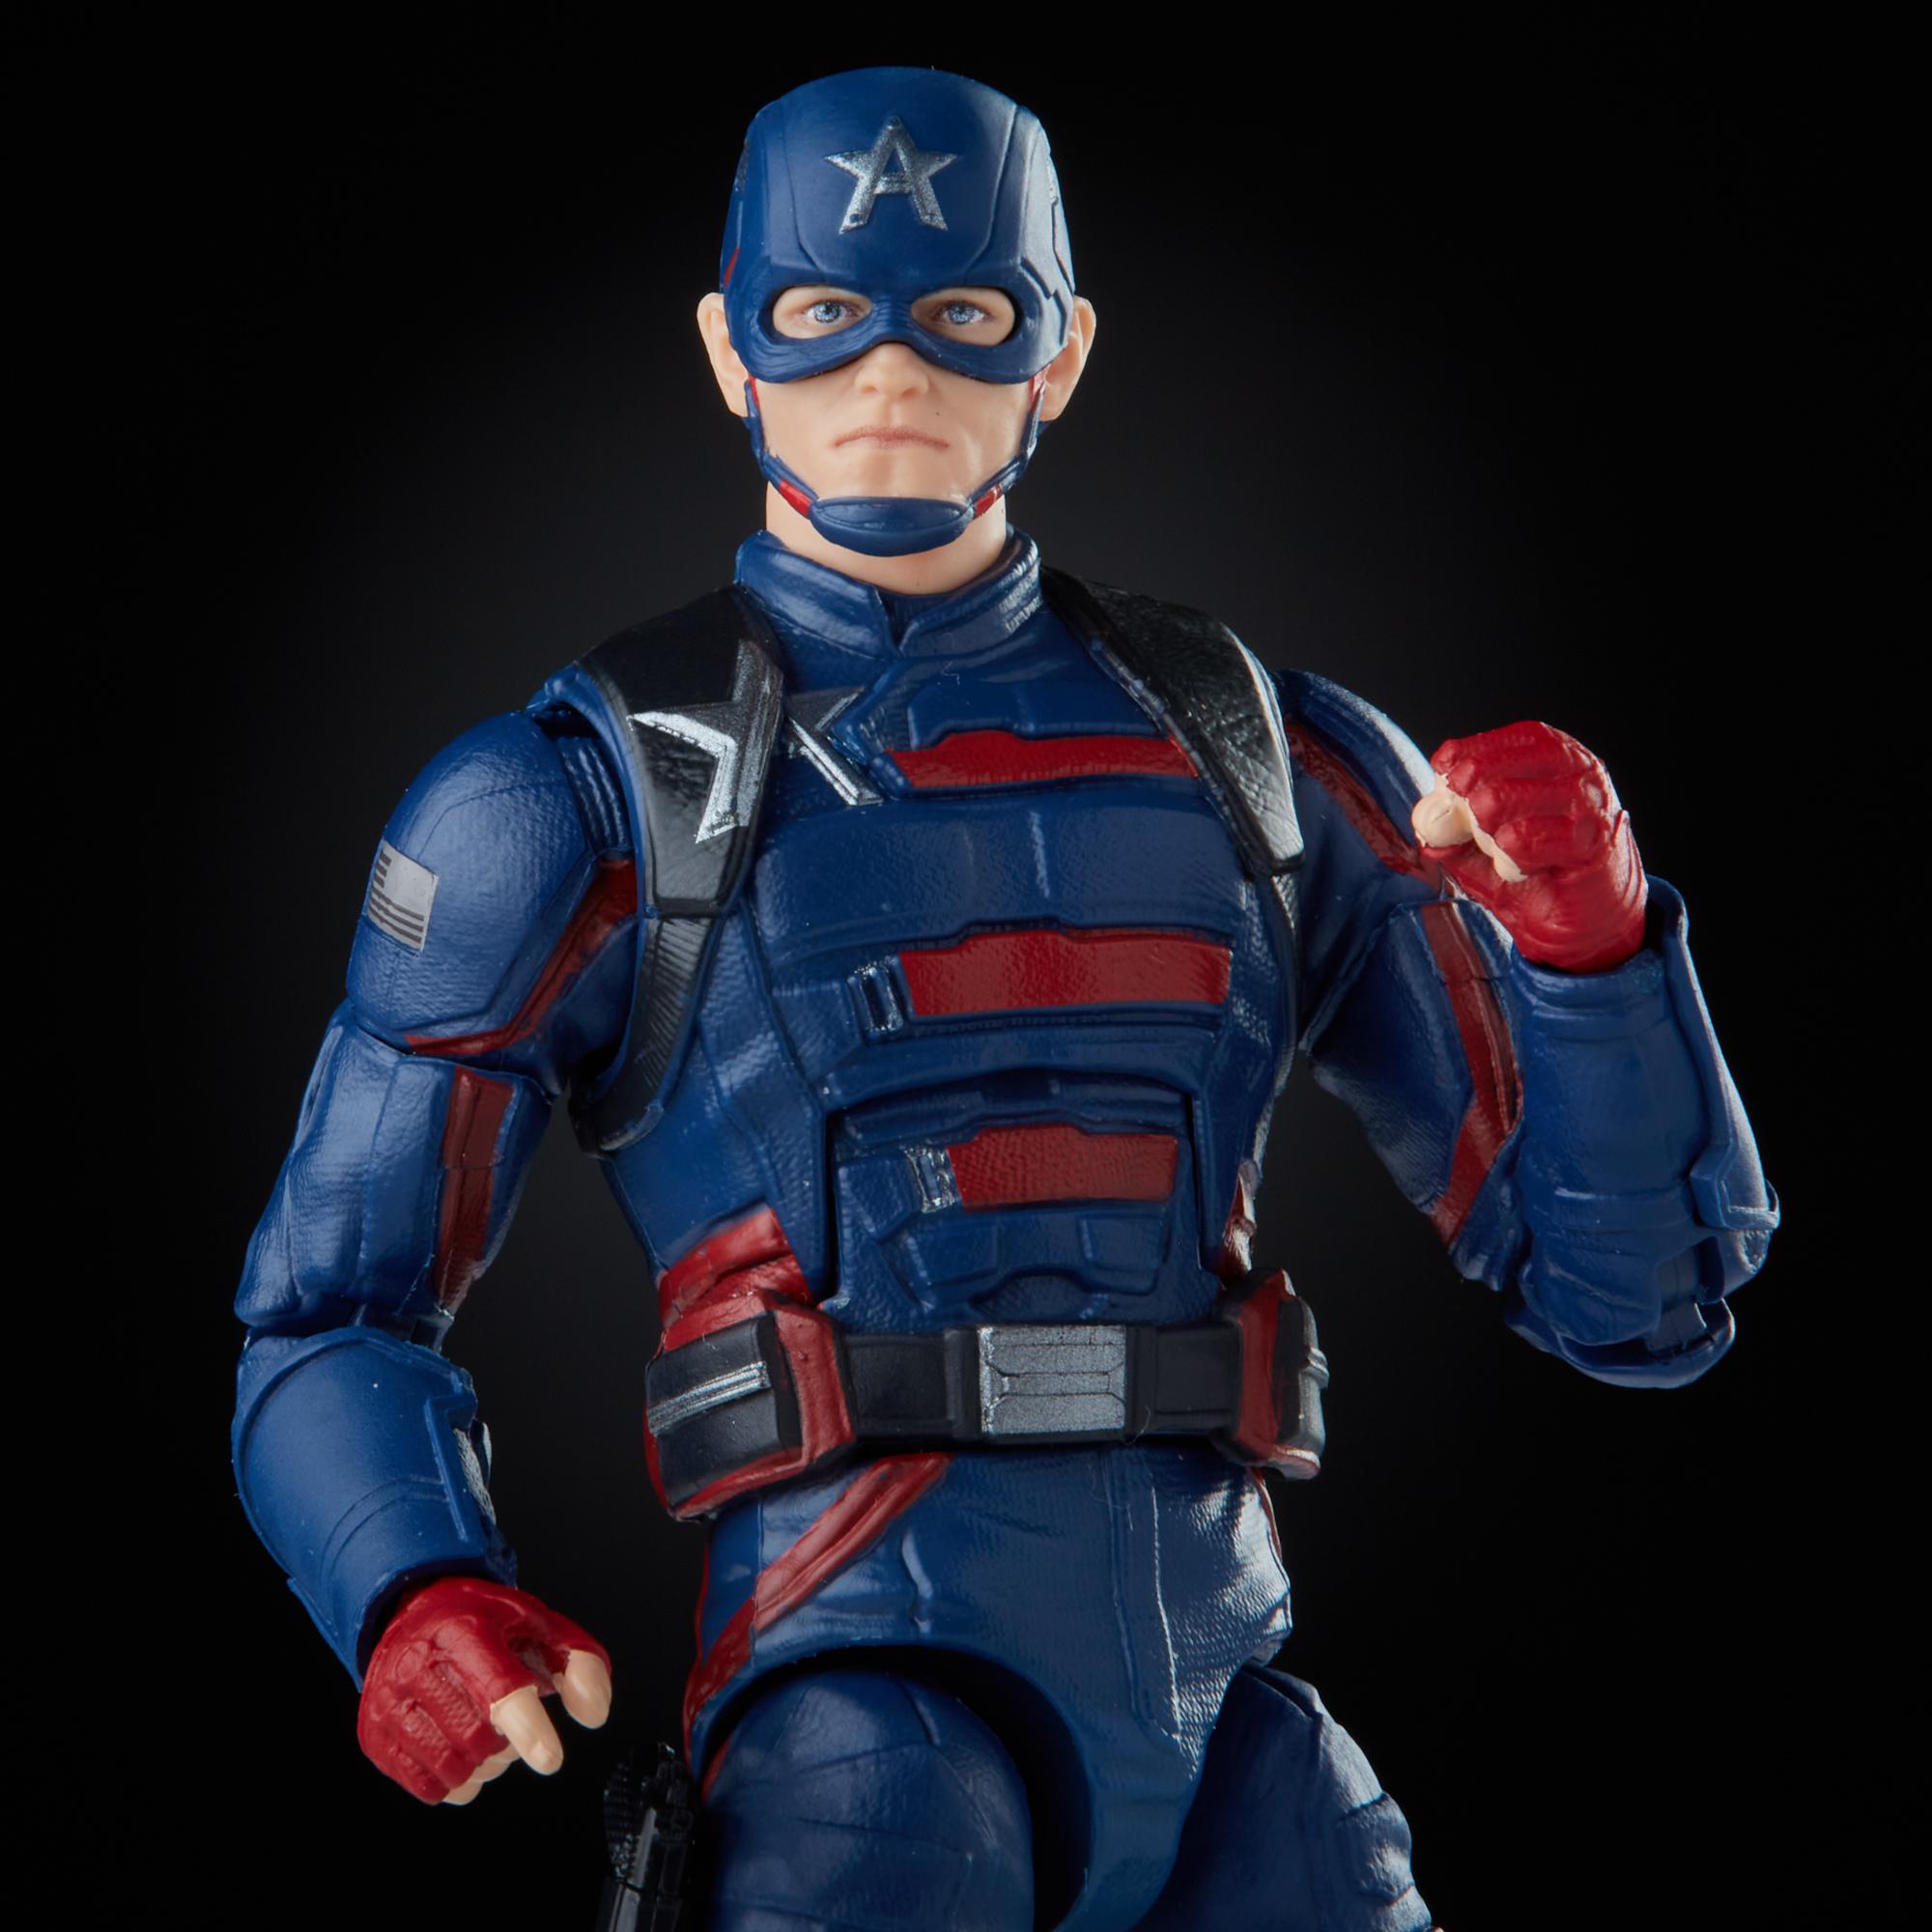 Marvel Legends Series Captain America: John F. Walker F02245L0 5010993860753